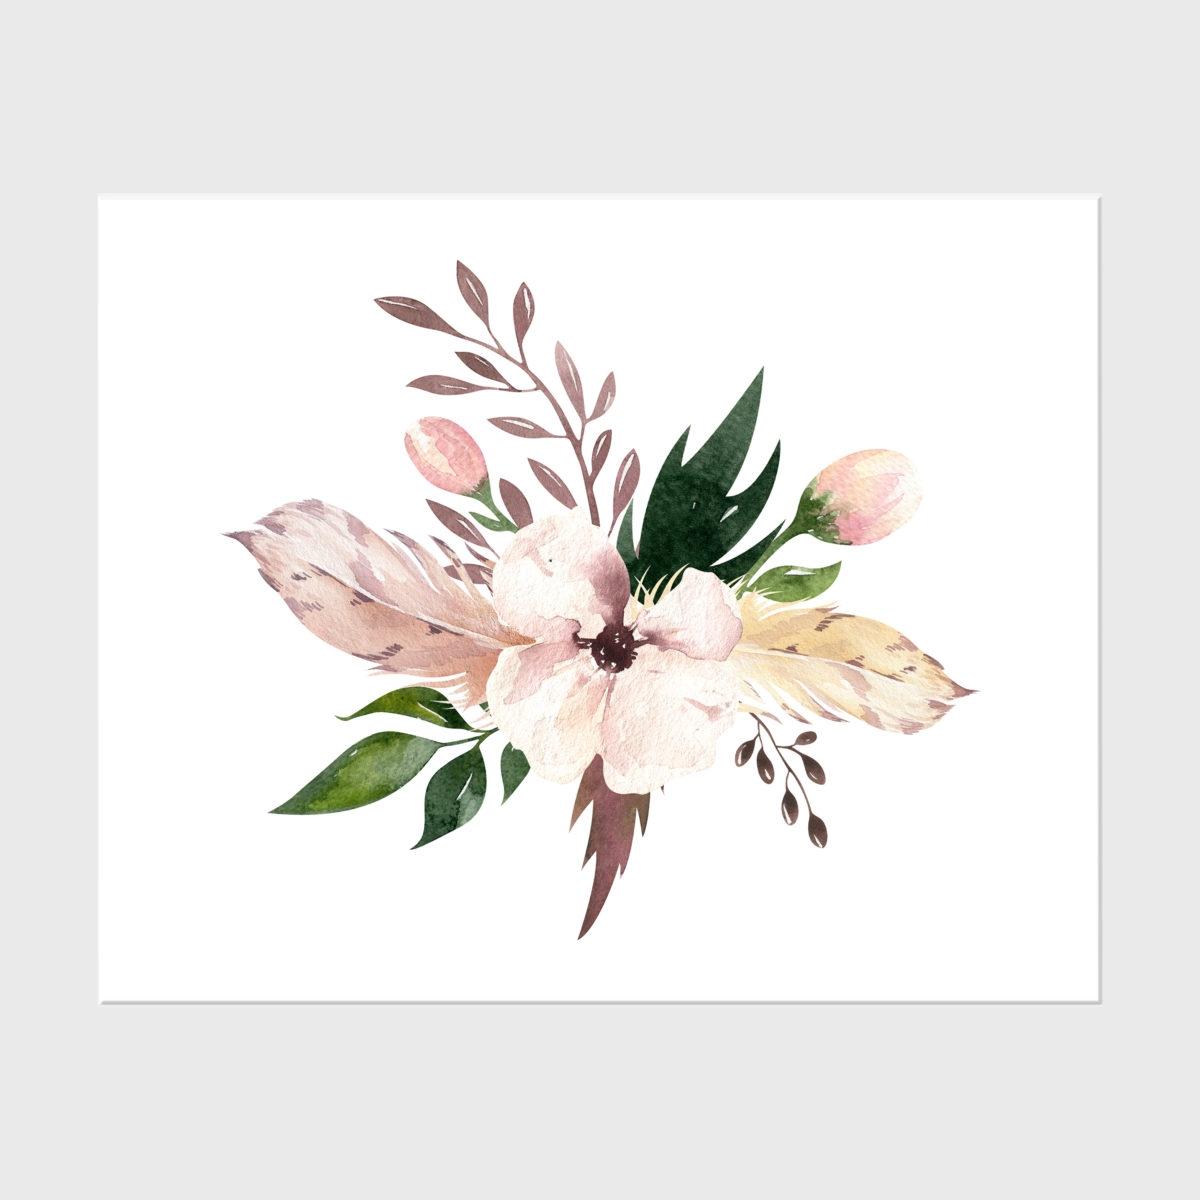 39. Floral (9)